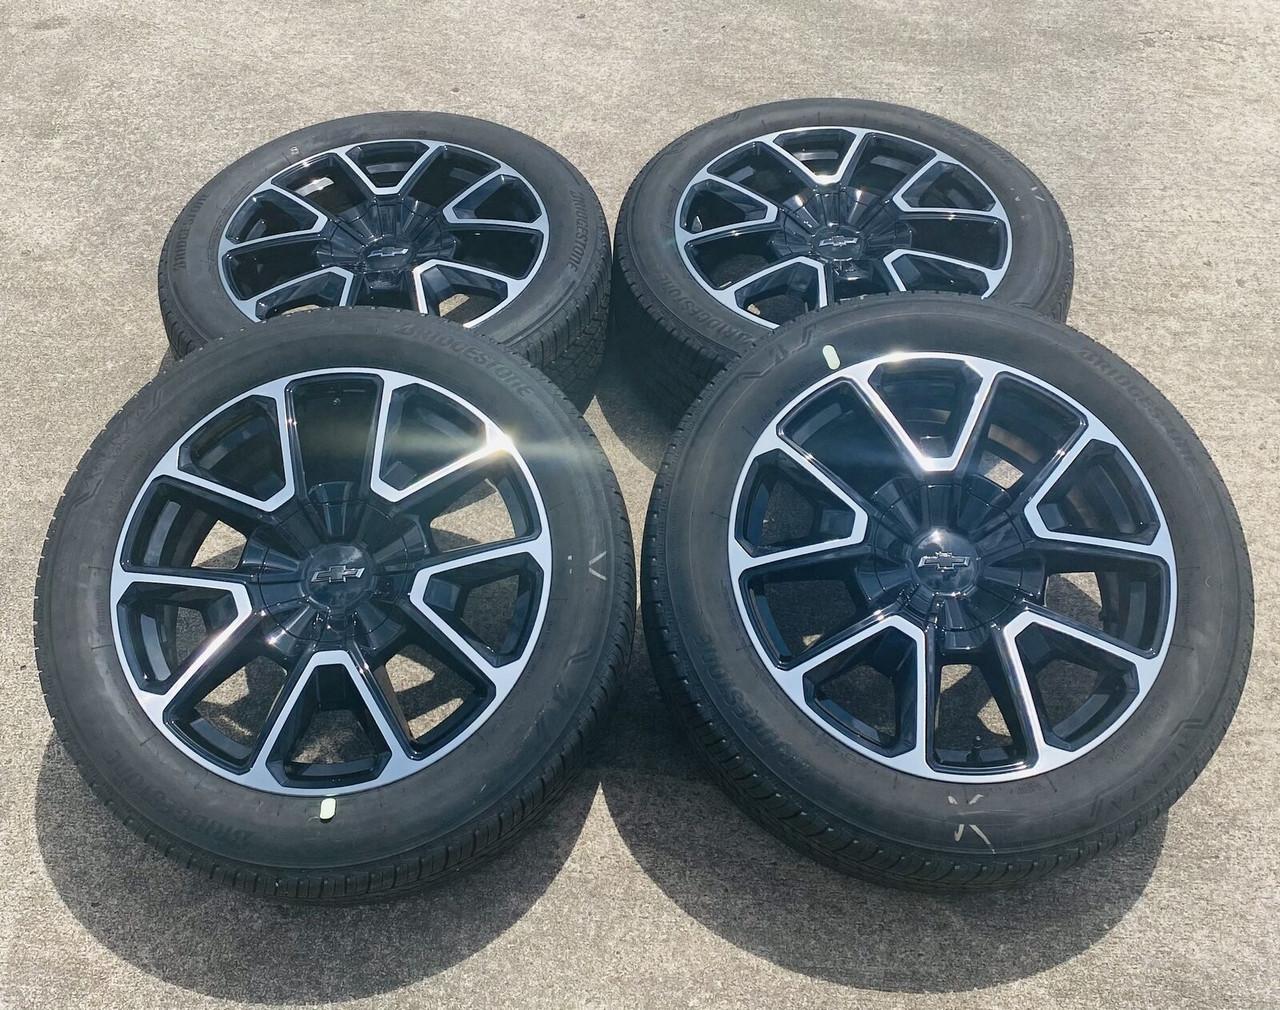 "New OEM Takeoff 22"" Chevy RST Black and Machine Wheels and Bridgestone Tires - Set of 4"